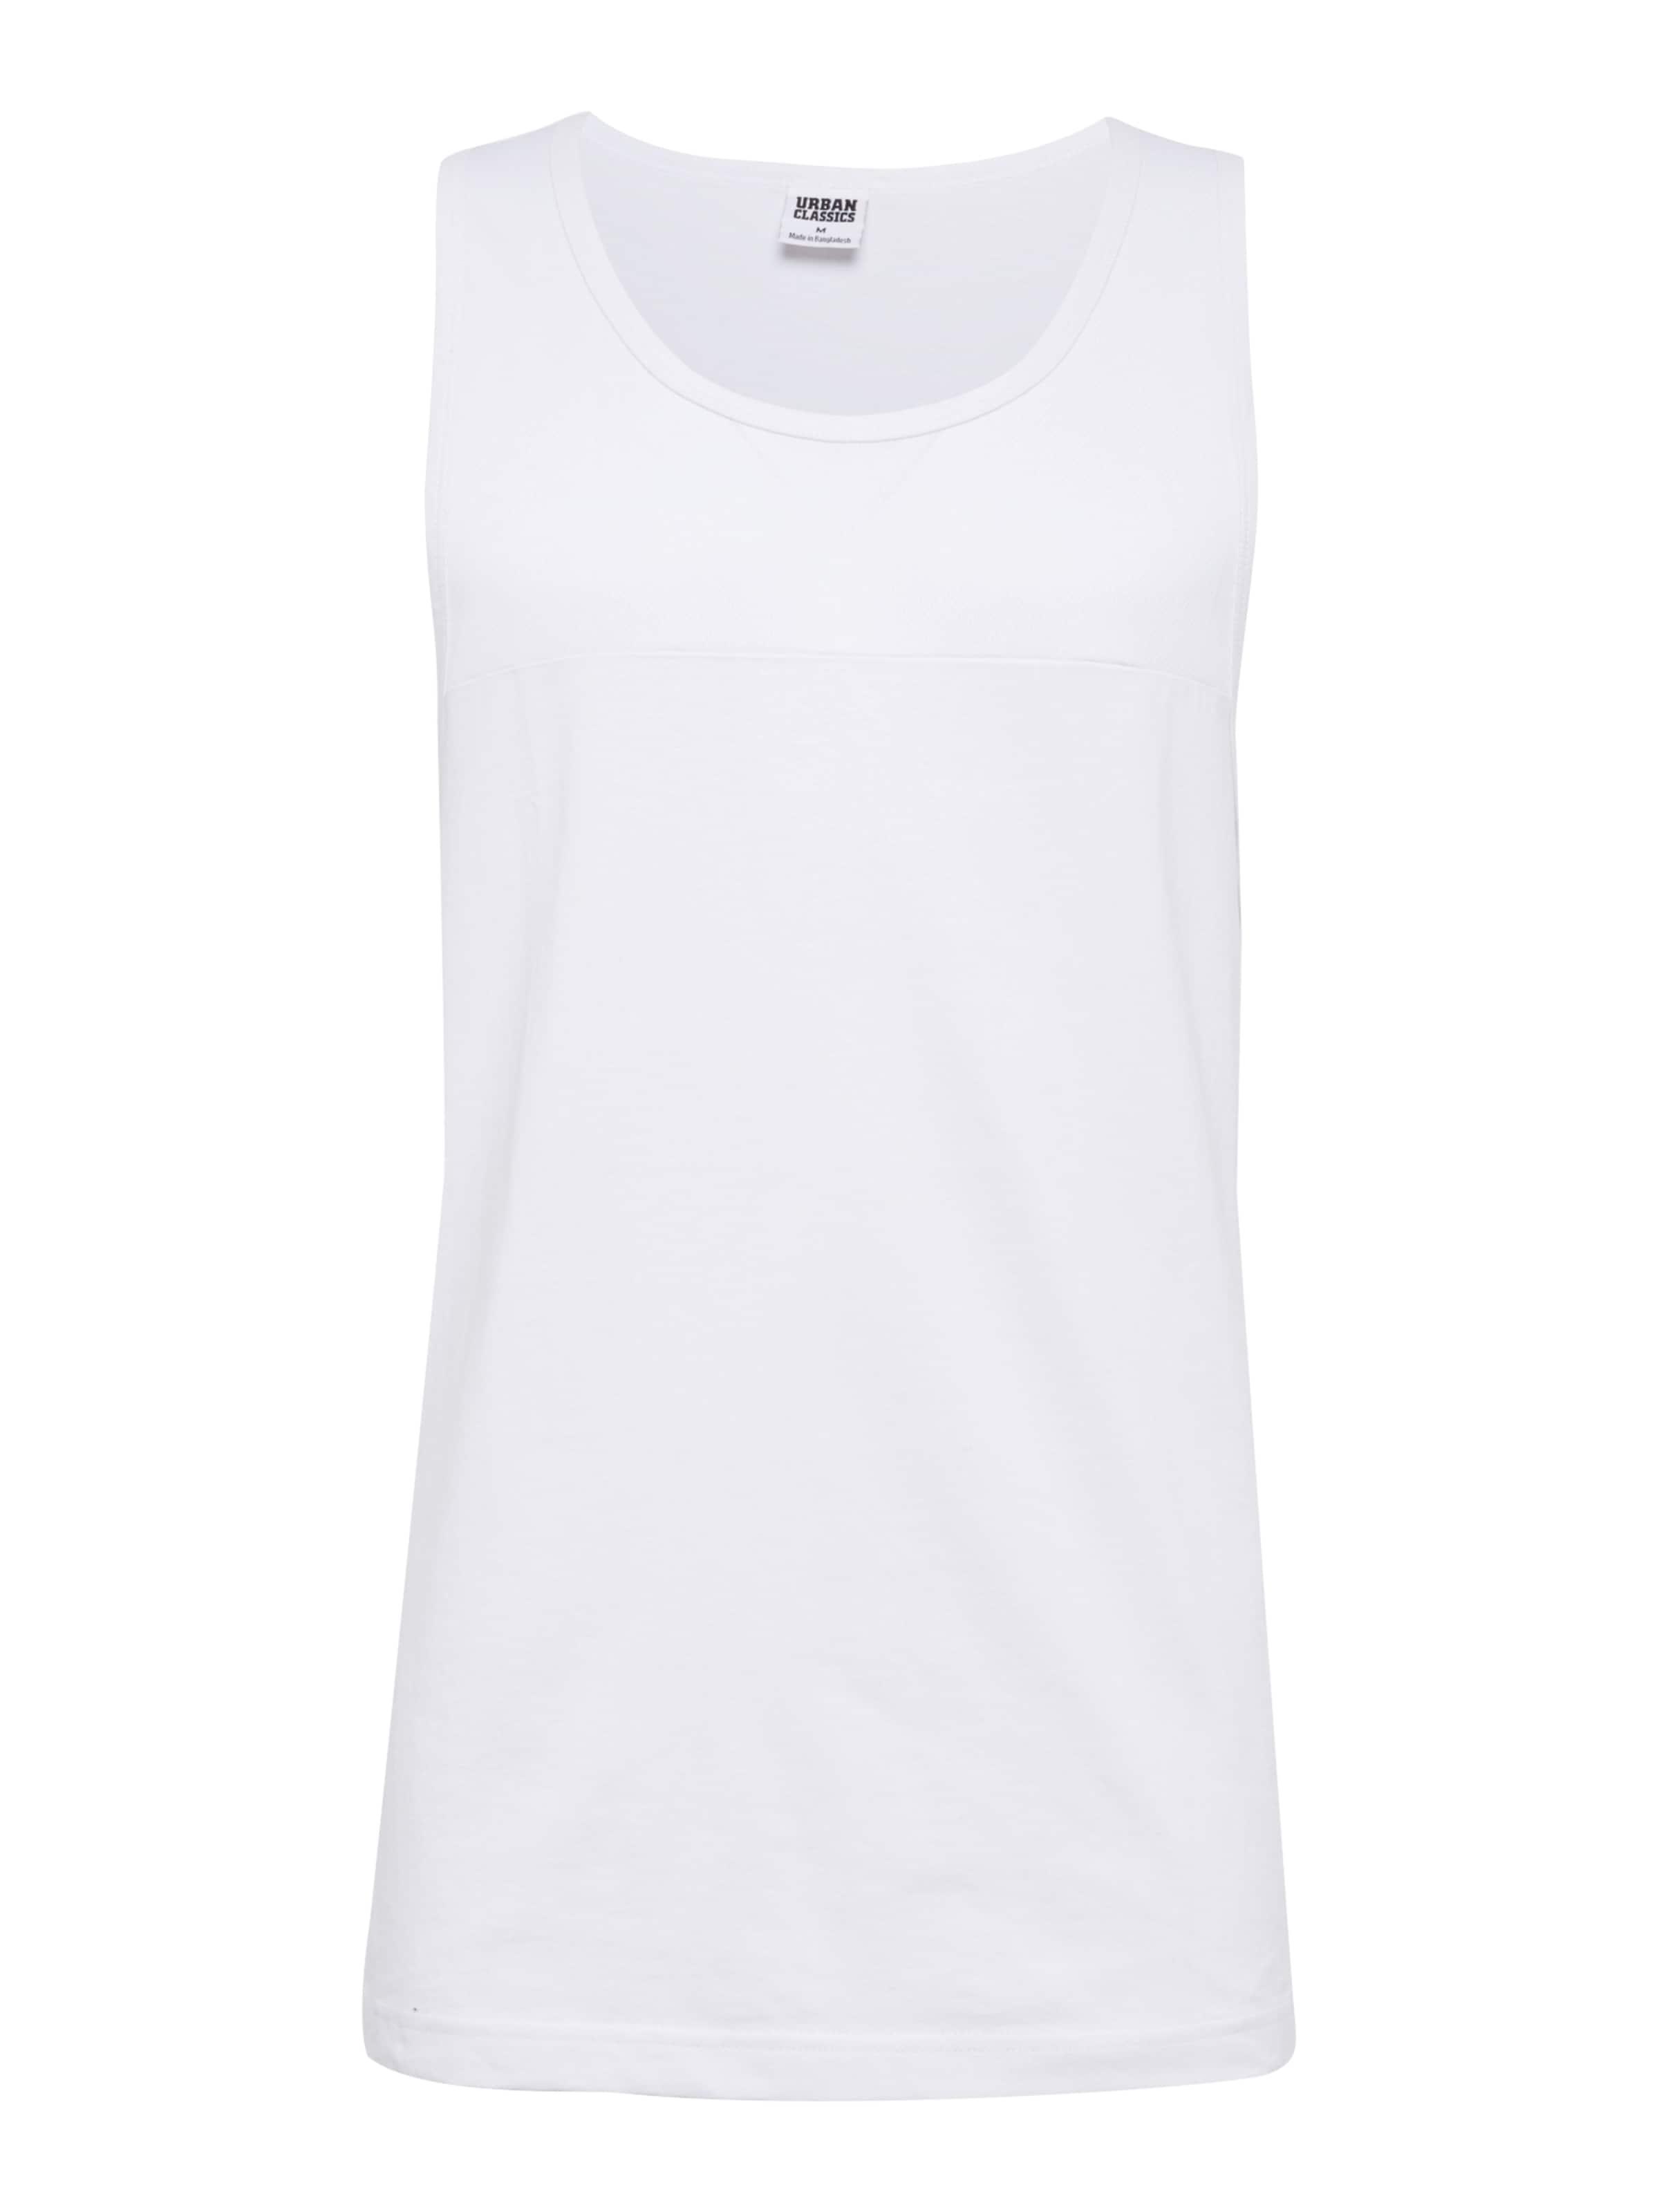 Panel 'mesh Blanc Urban Tank' En Classics T shirt TFcl3K1J